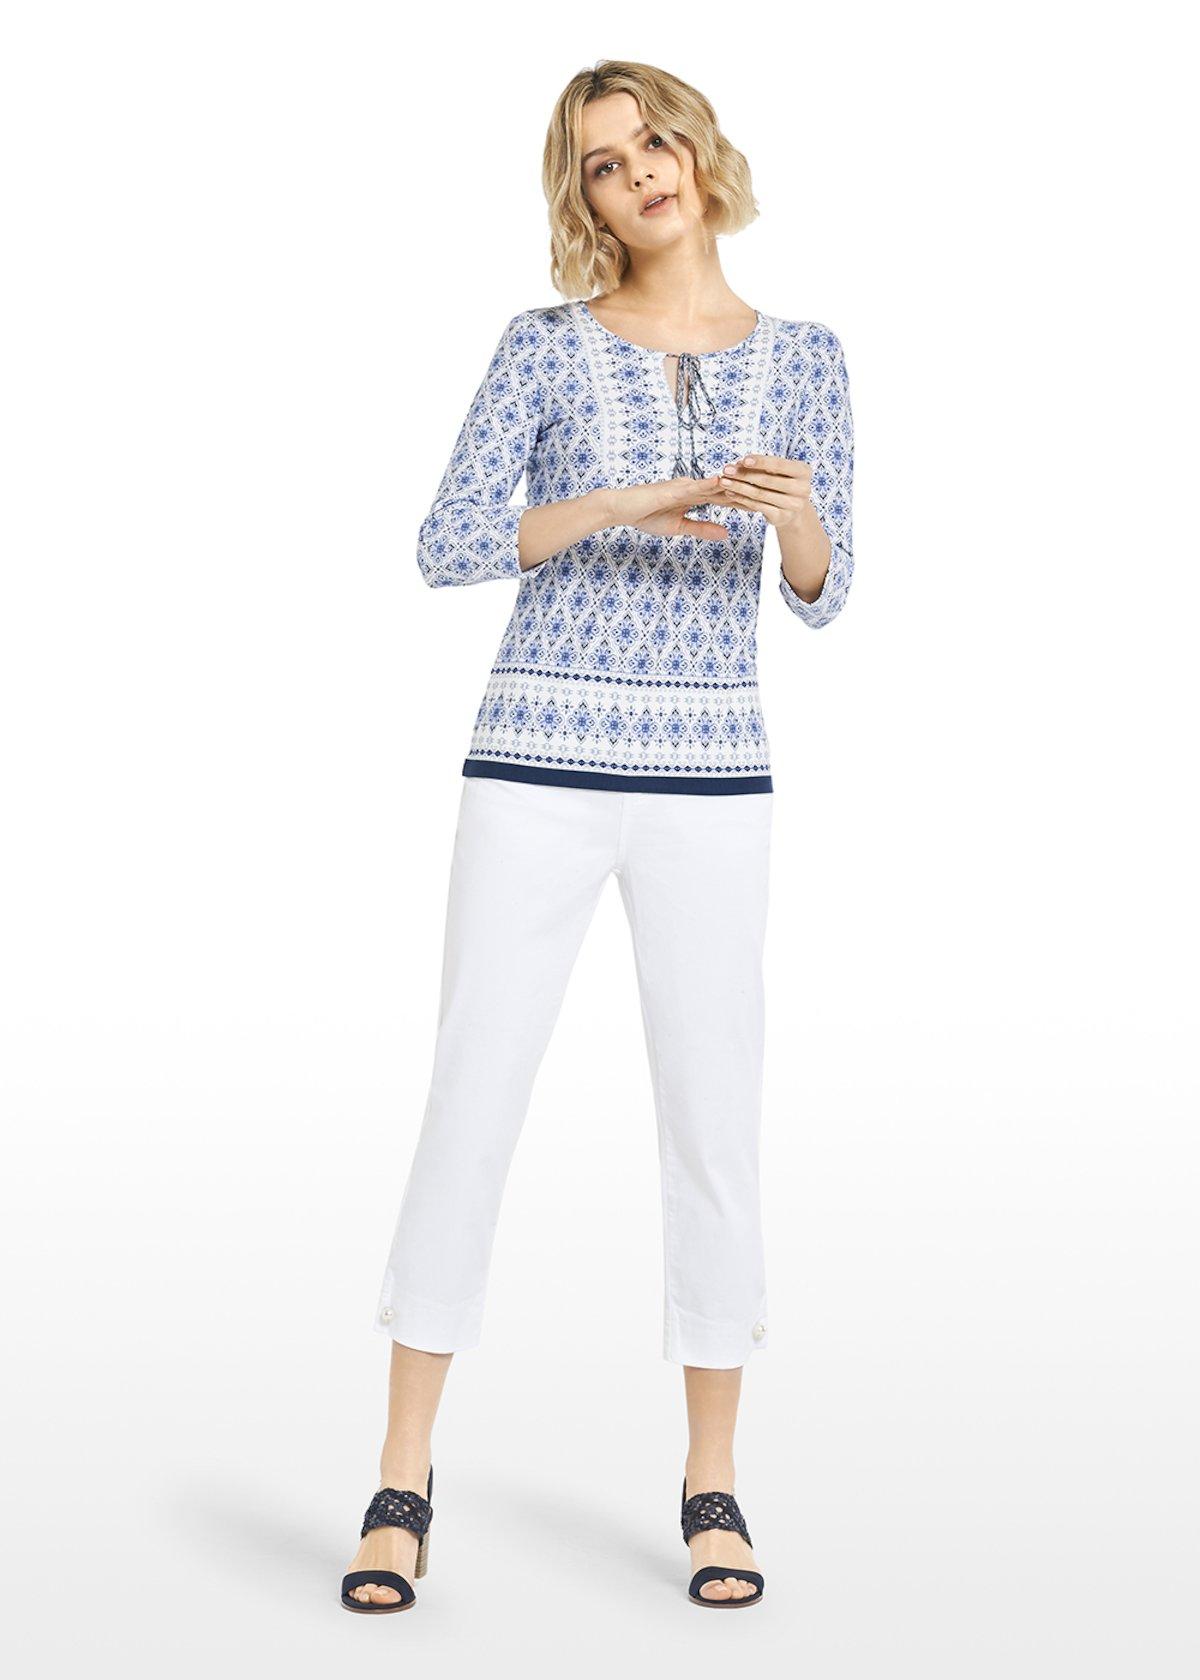 T-shirt Salir in jersey fantasia all-over azulejo - White / Avion  Fantasia - Donna - Immagine categoria